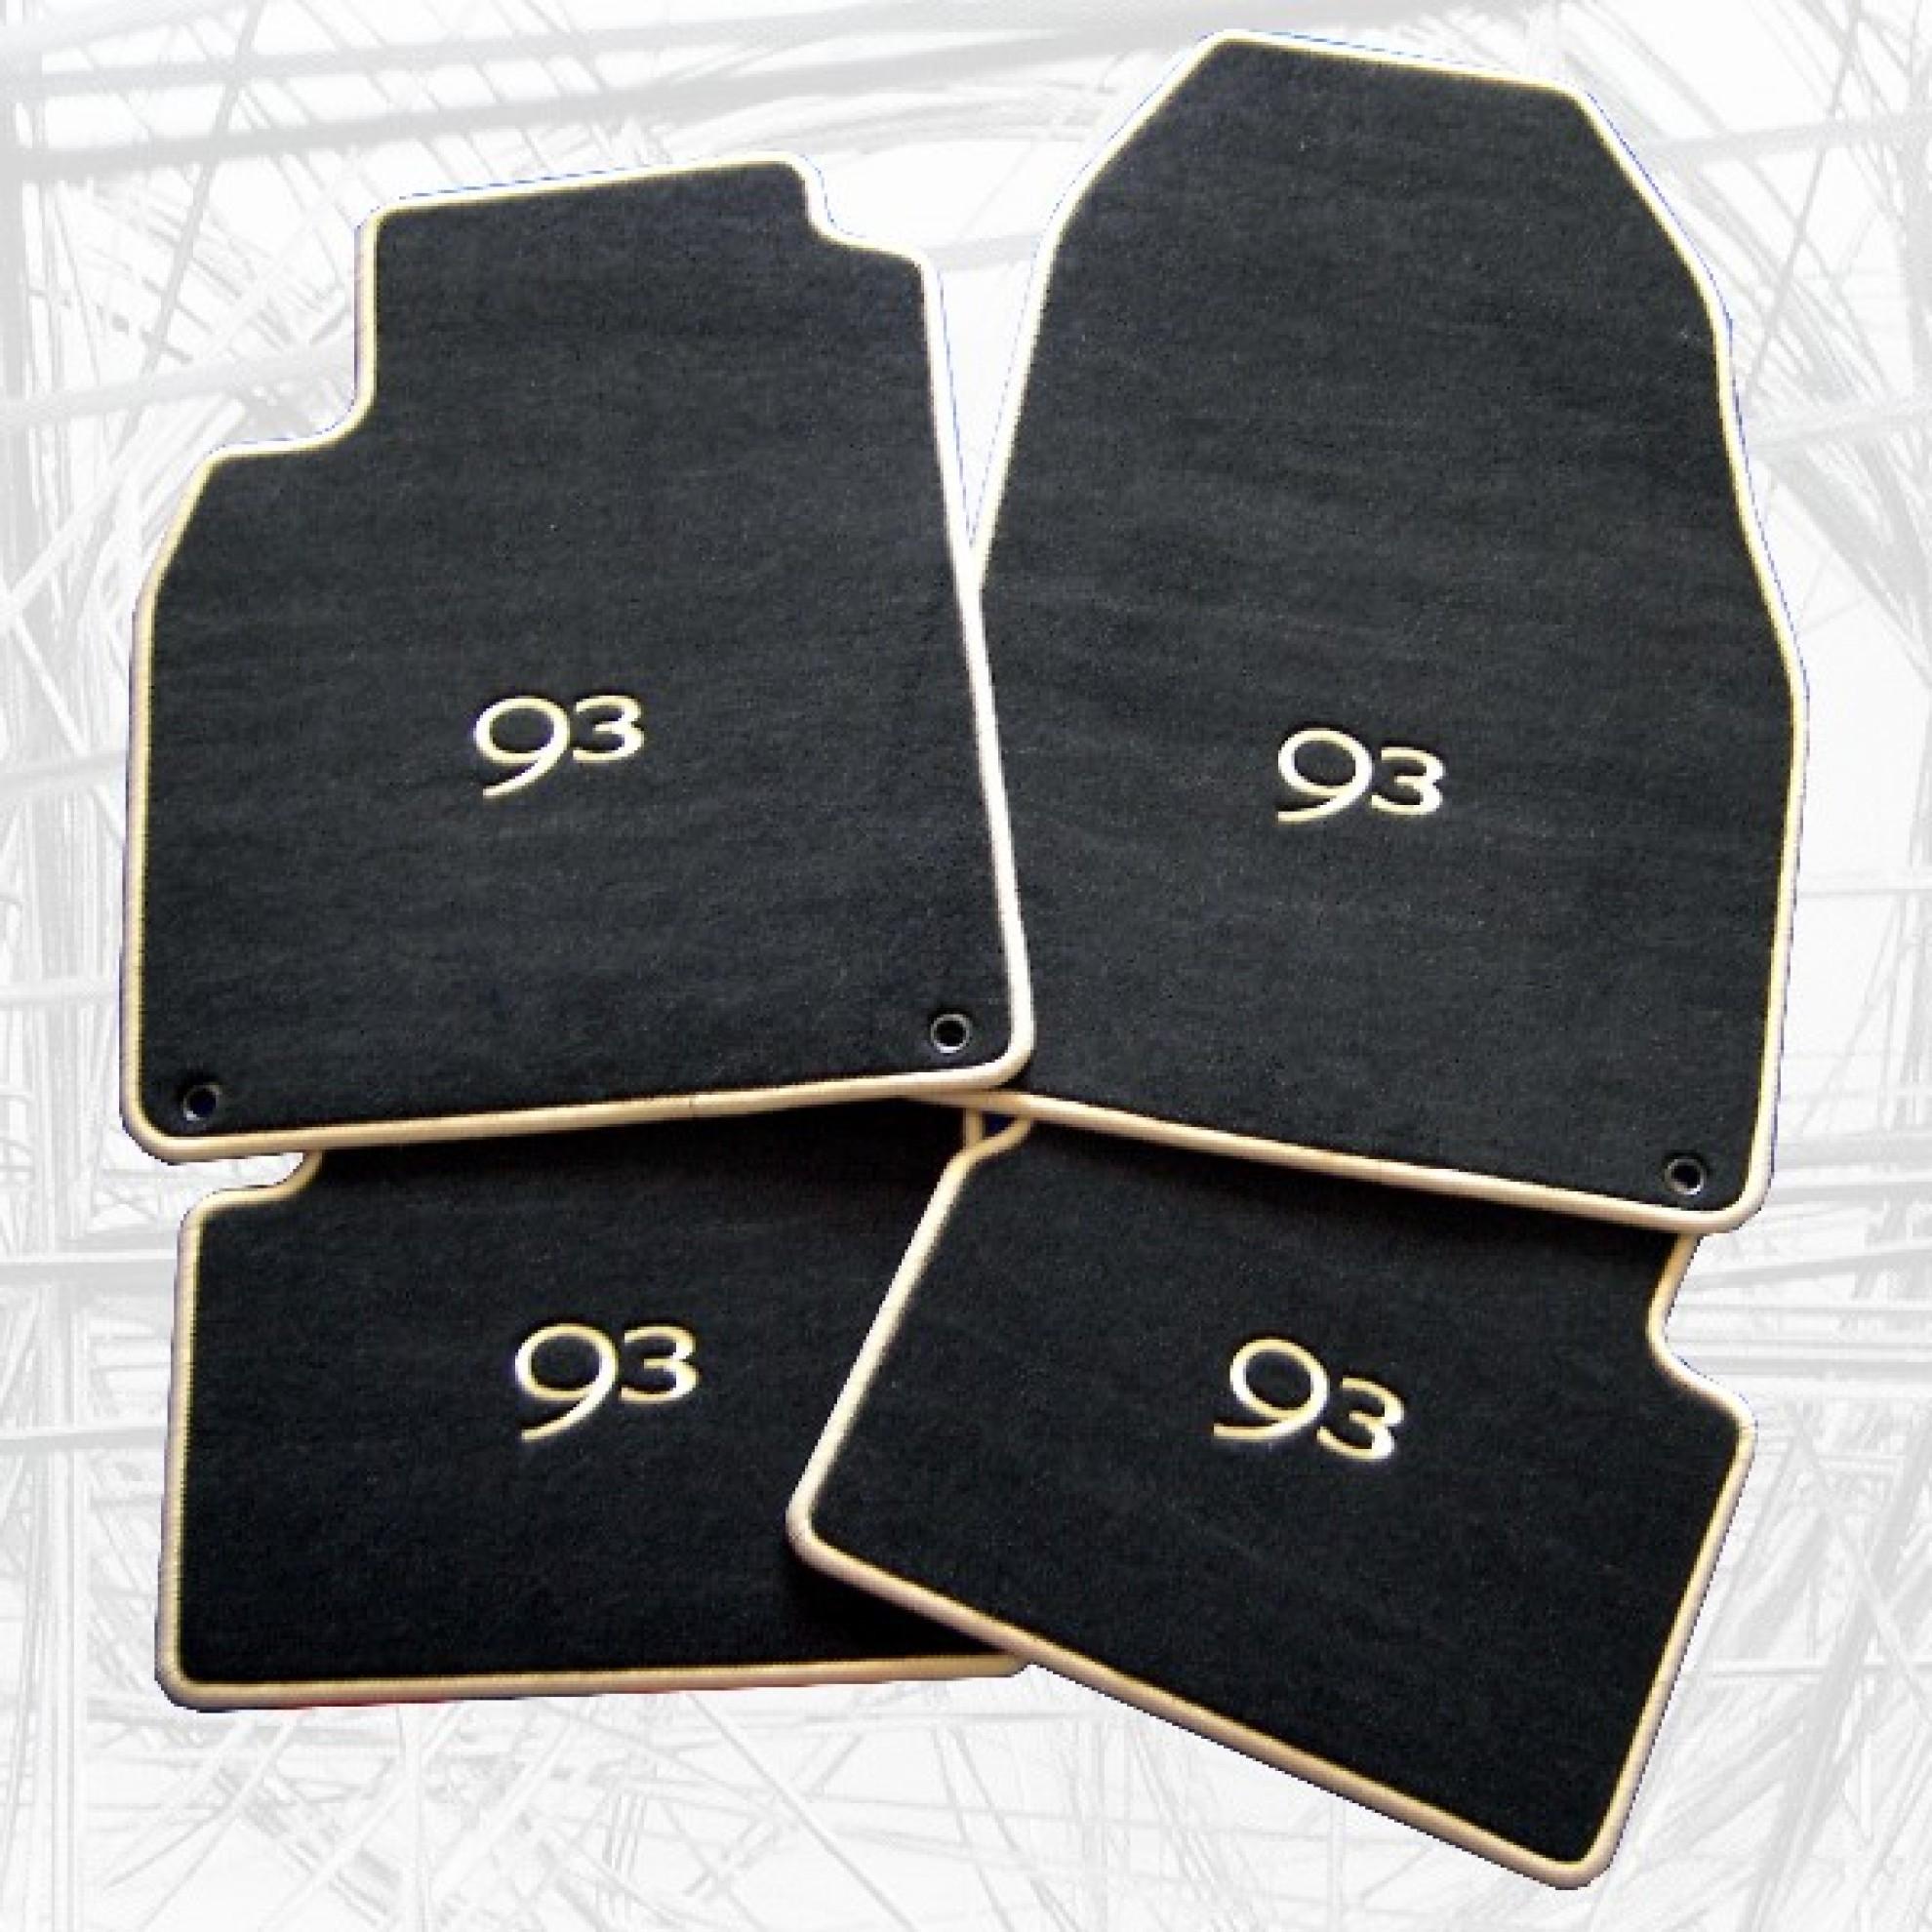 autofussmatten f r saab 9 3 mit stickmotiv. Black Bedroom Furniture Sets. Home Design Ideas